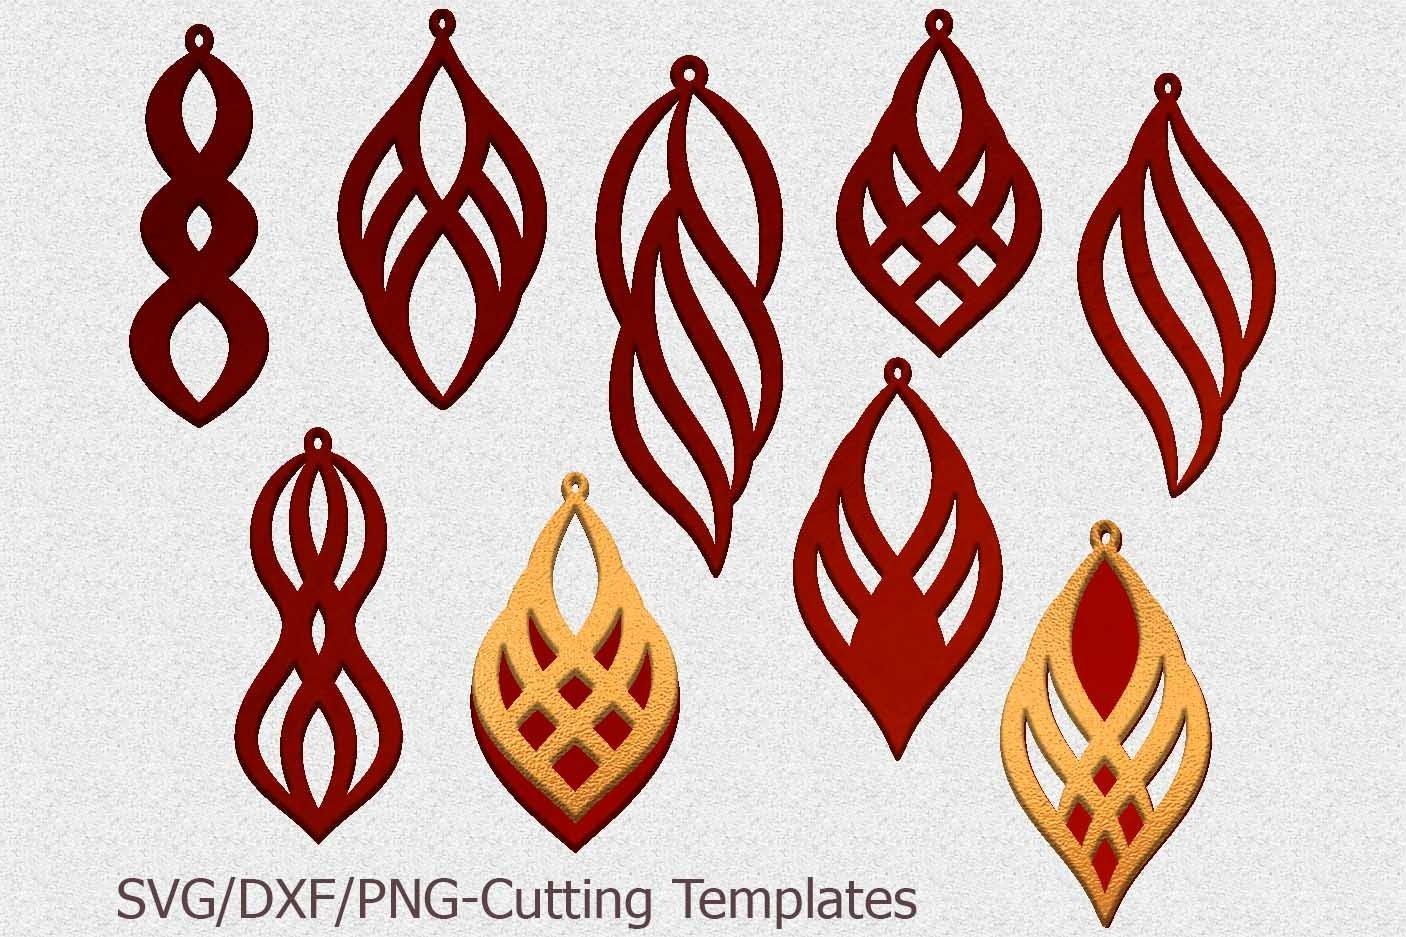 Diamond Earring SVG Diamond Pendant svg Leather Earring Jewelry Laser Cut Template Commercial Use Diamond Tear drop Vector DXF